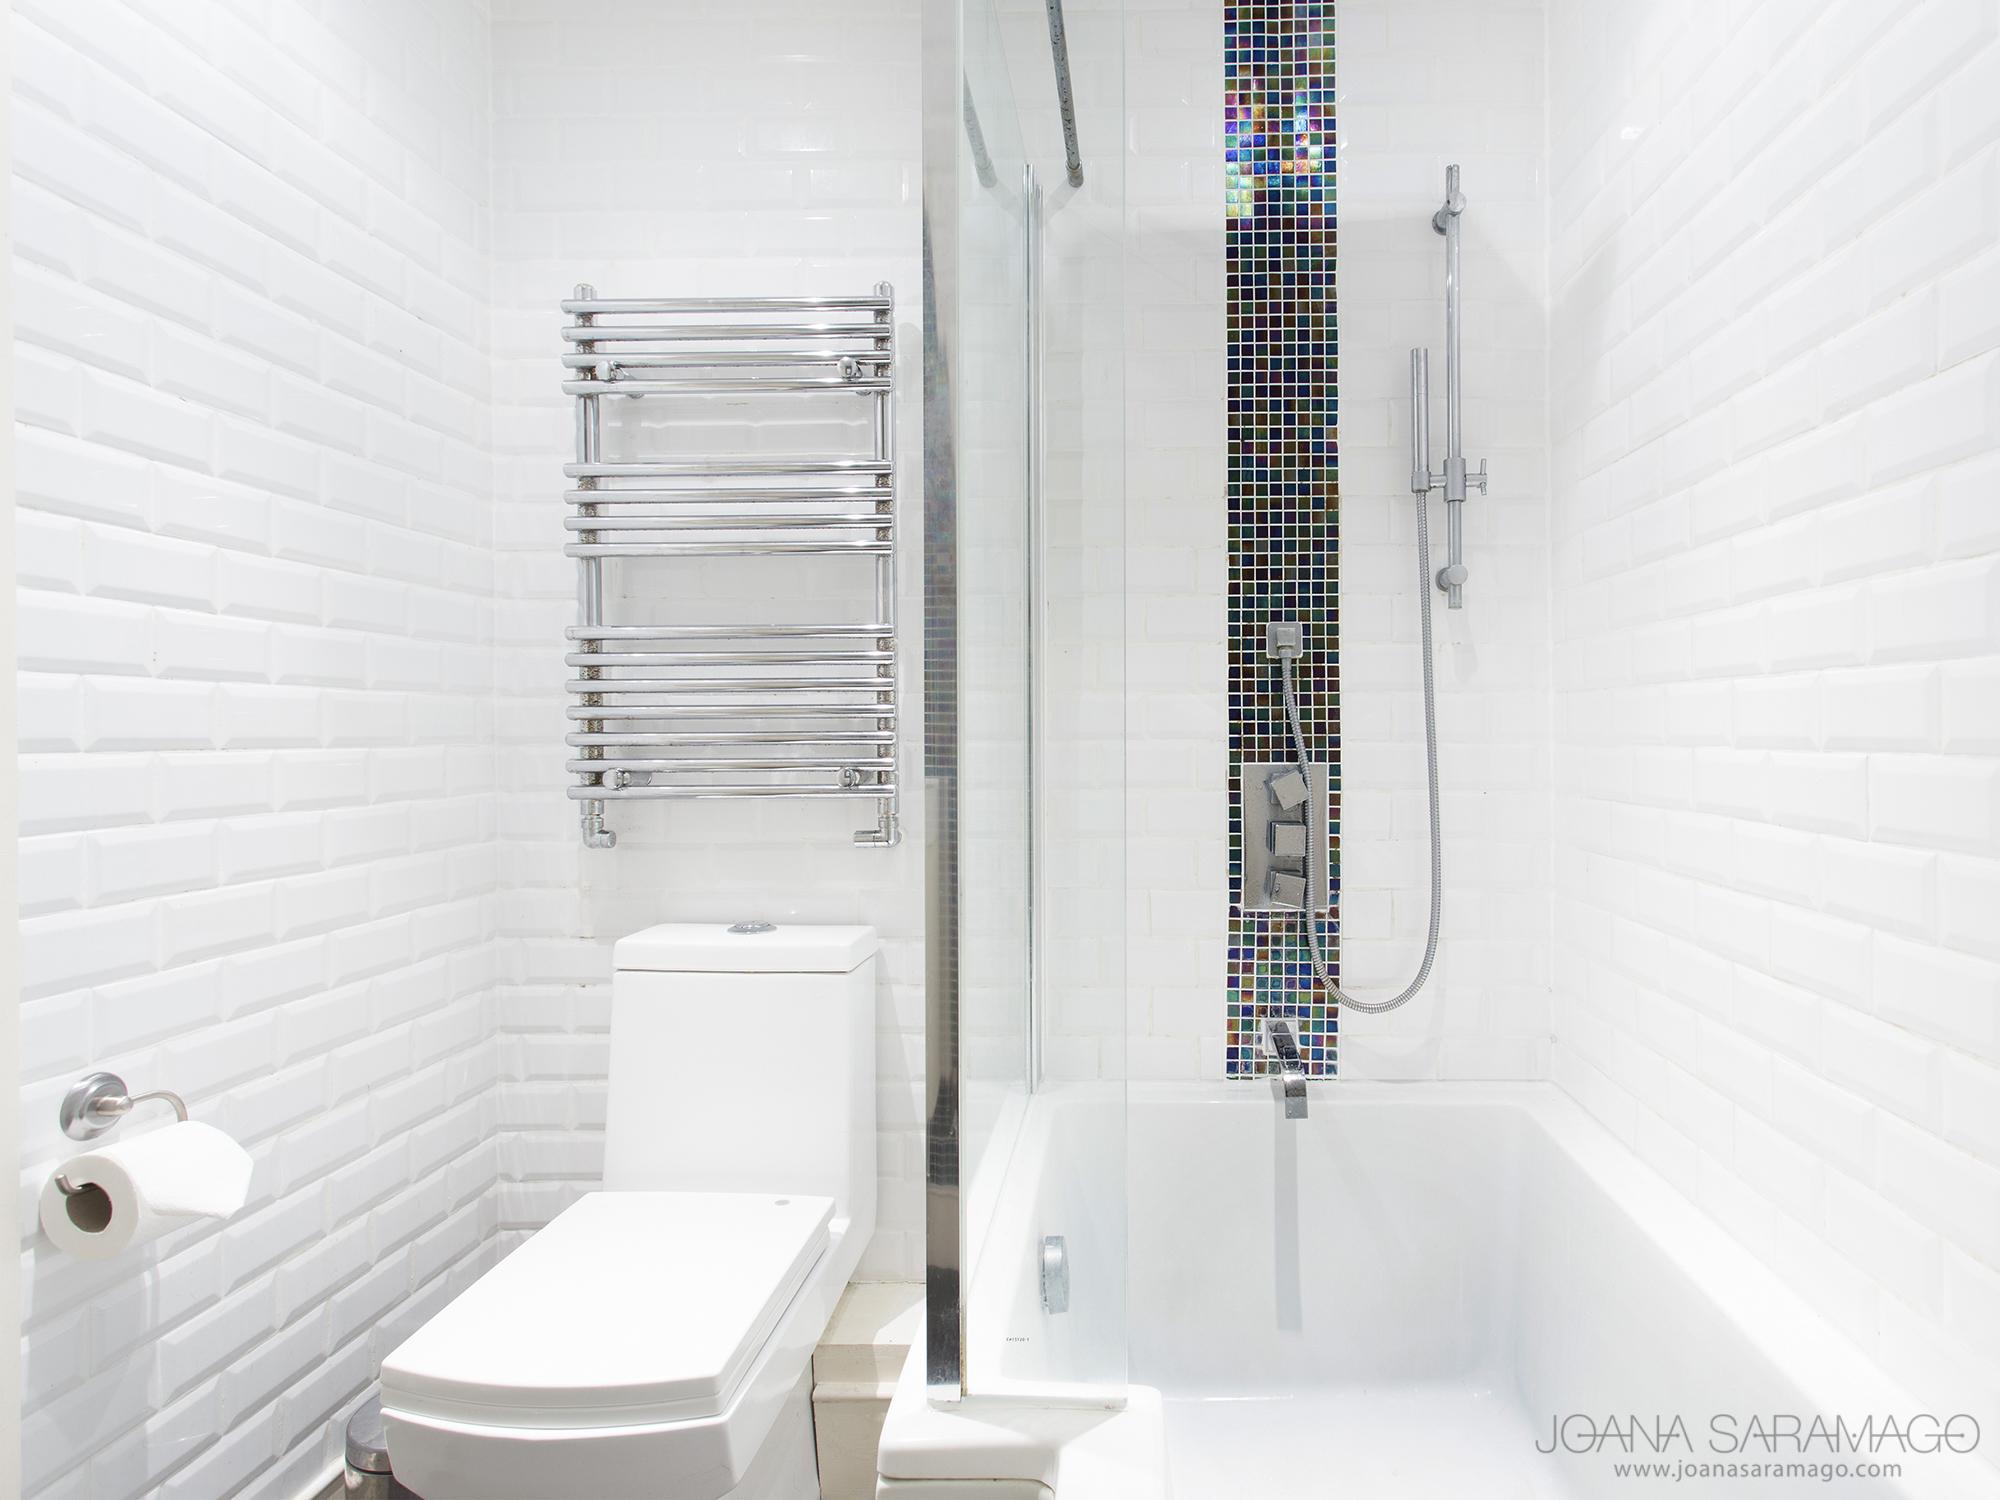 bathroom_02_joanasaramago_k.jpg